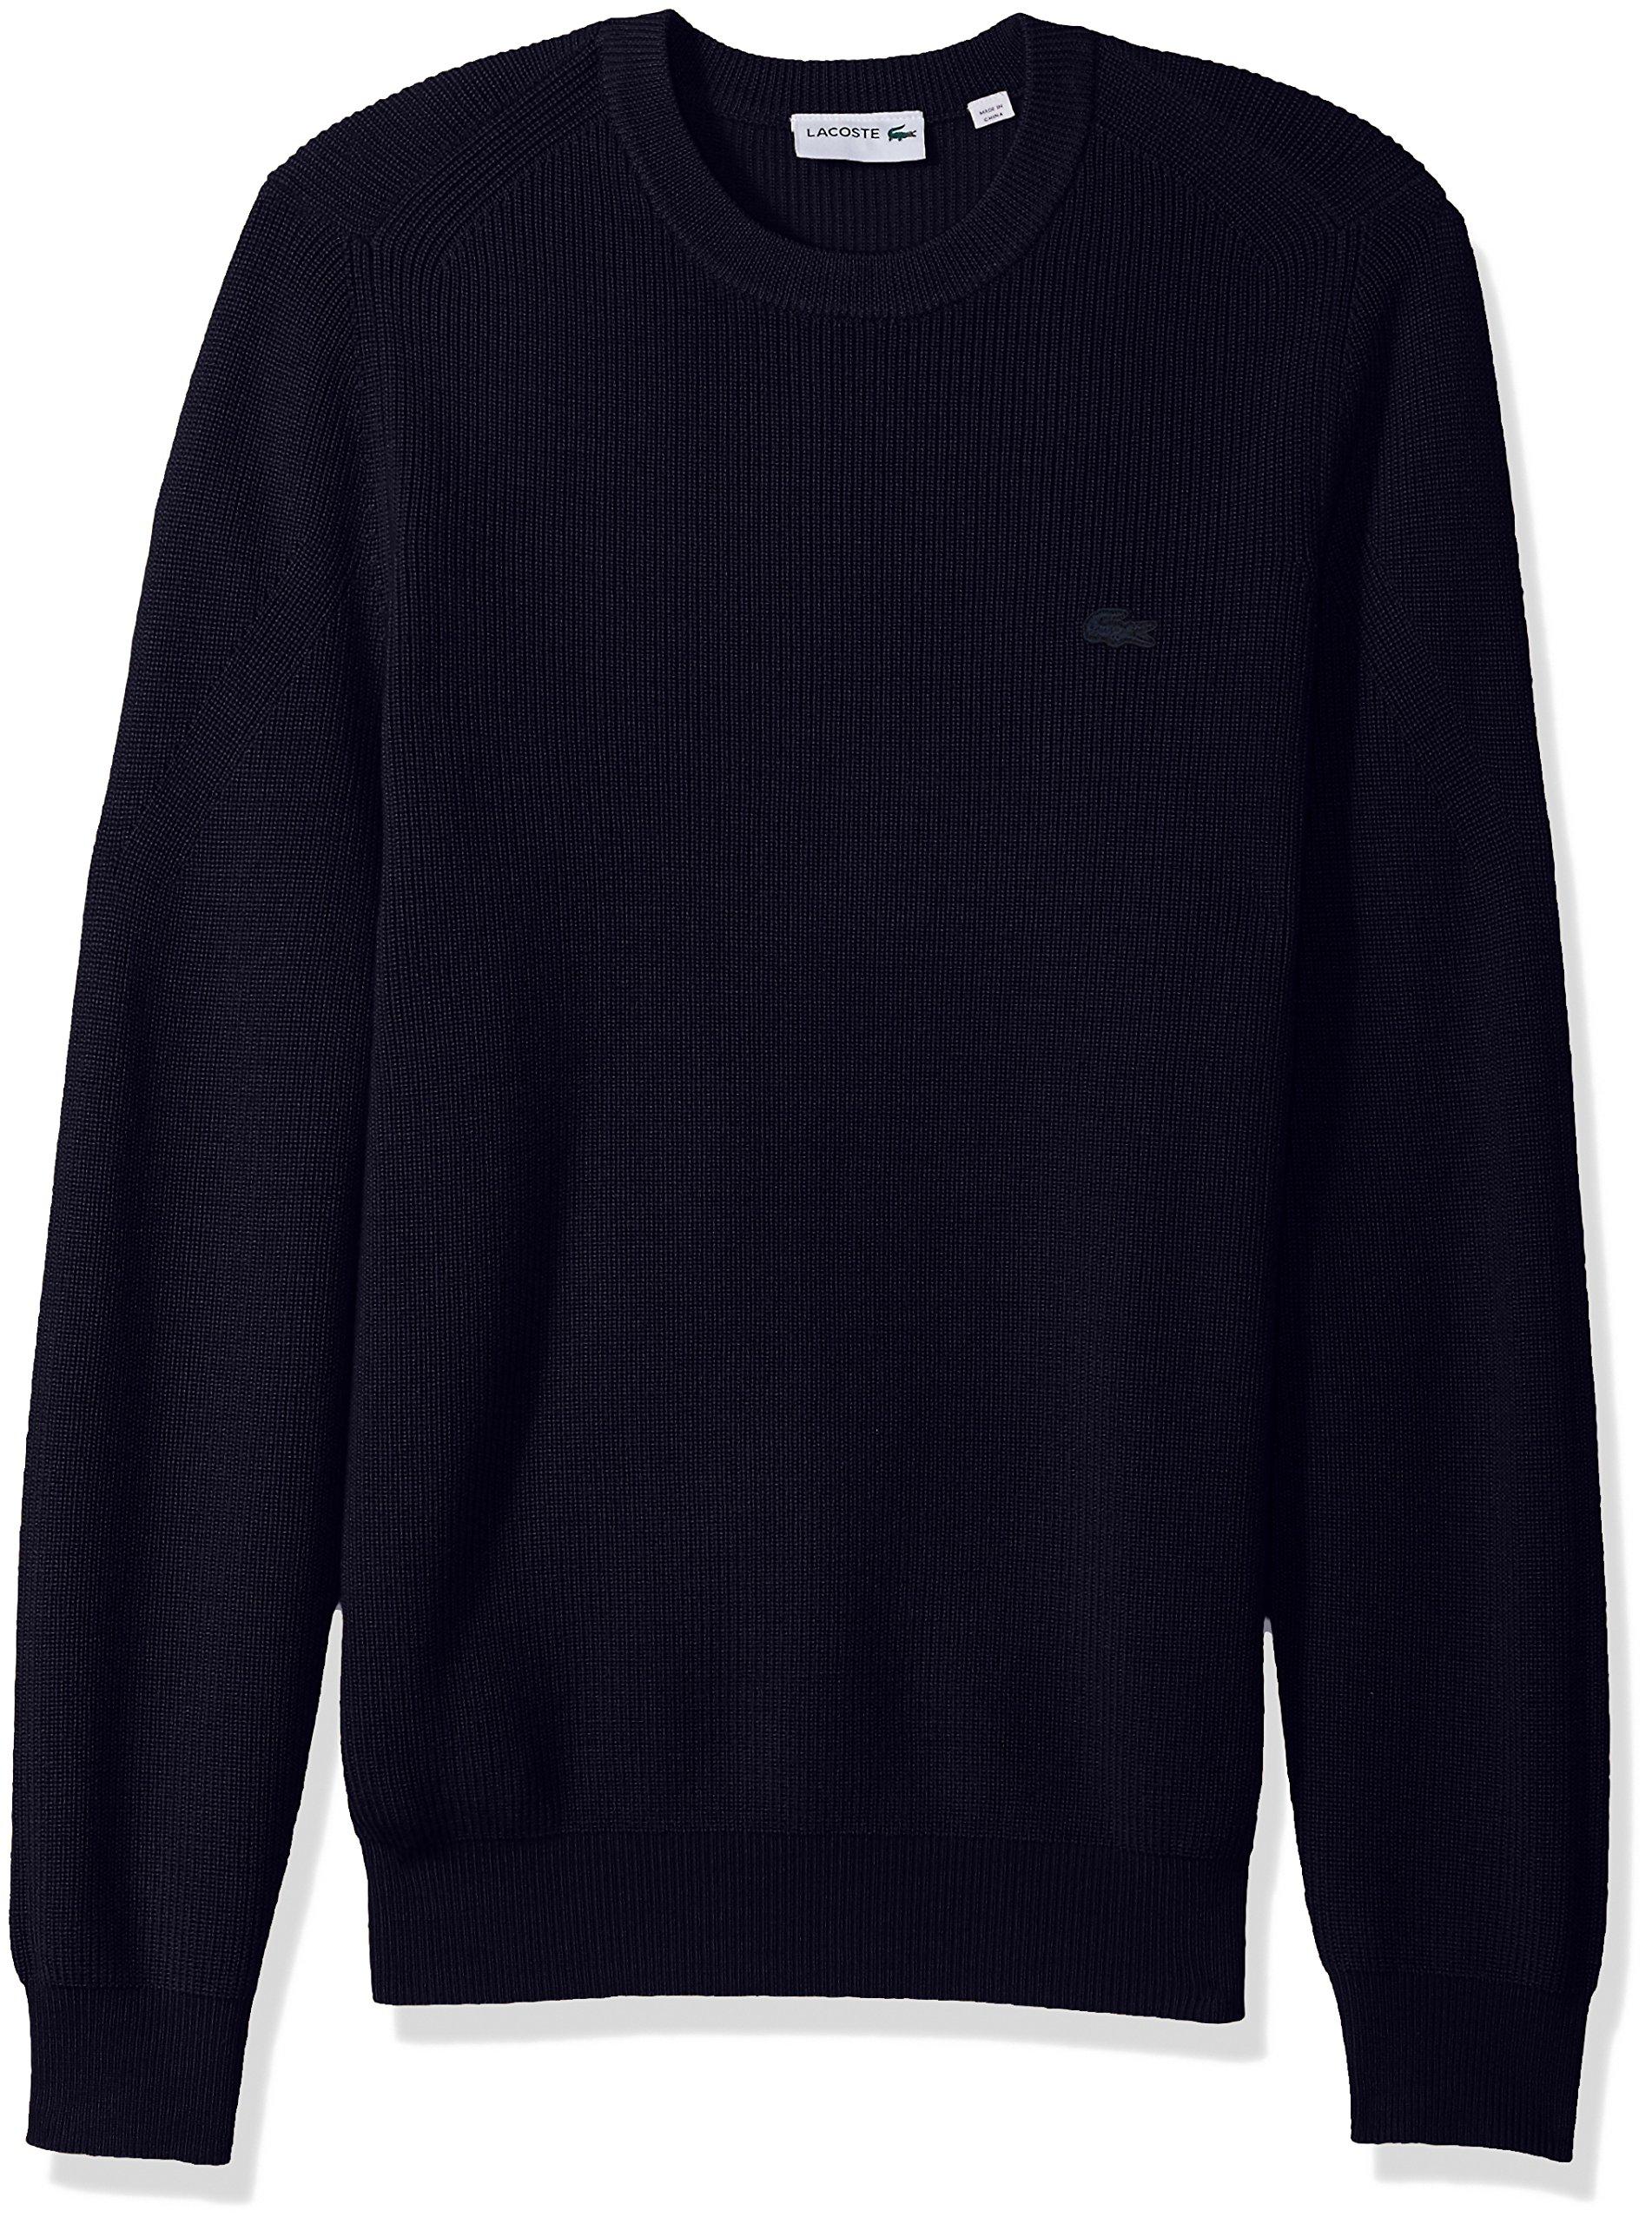 Lacoste Men's Wool Half Cardigan Rib Sweater with Fancy Stitch, Navy Blue, Medium